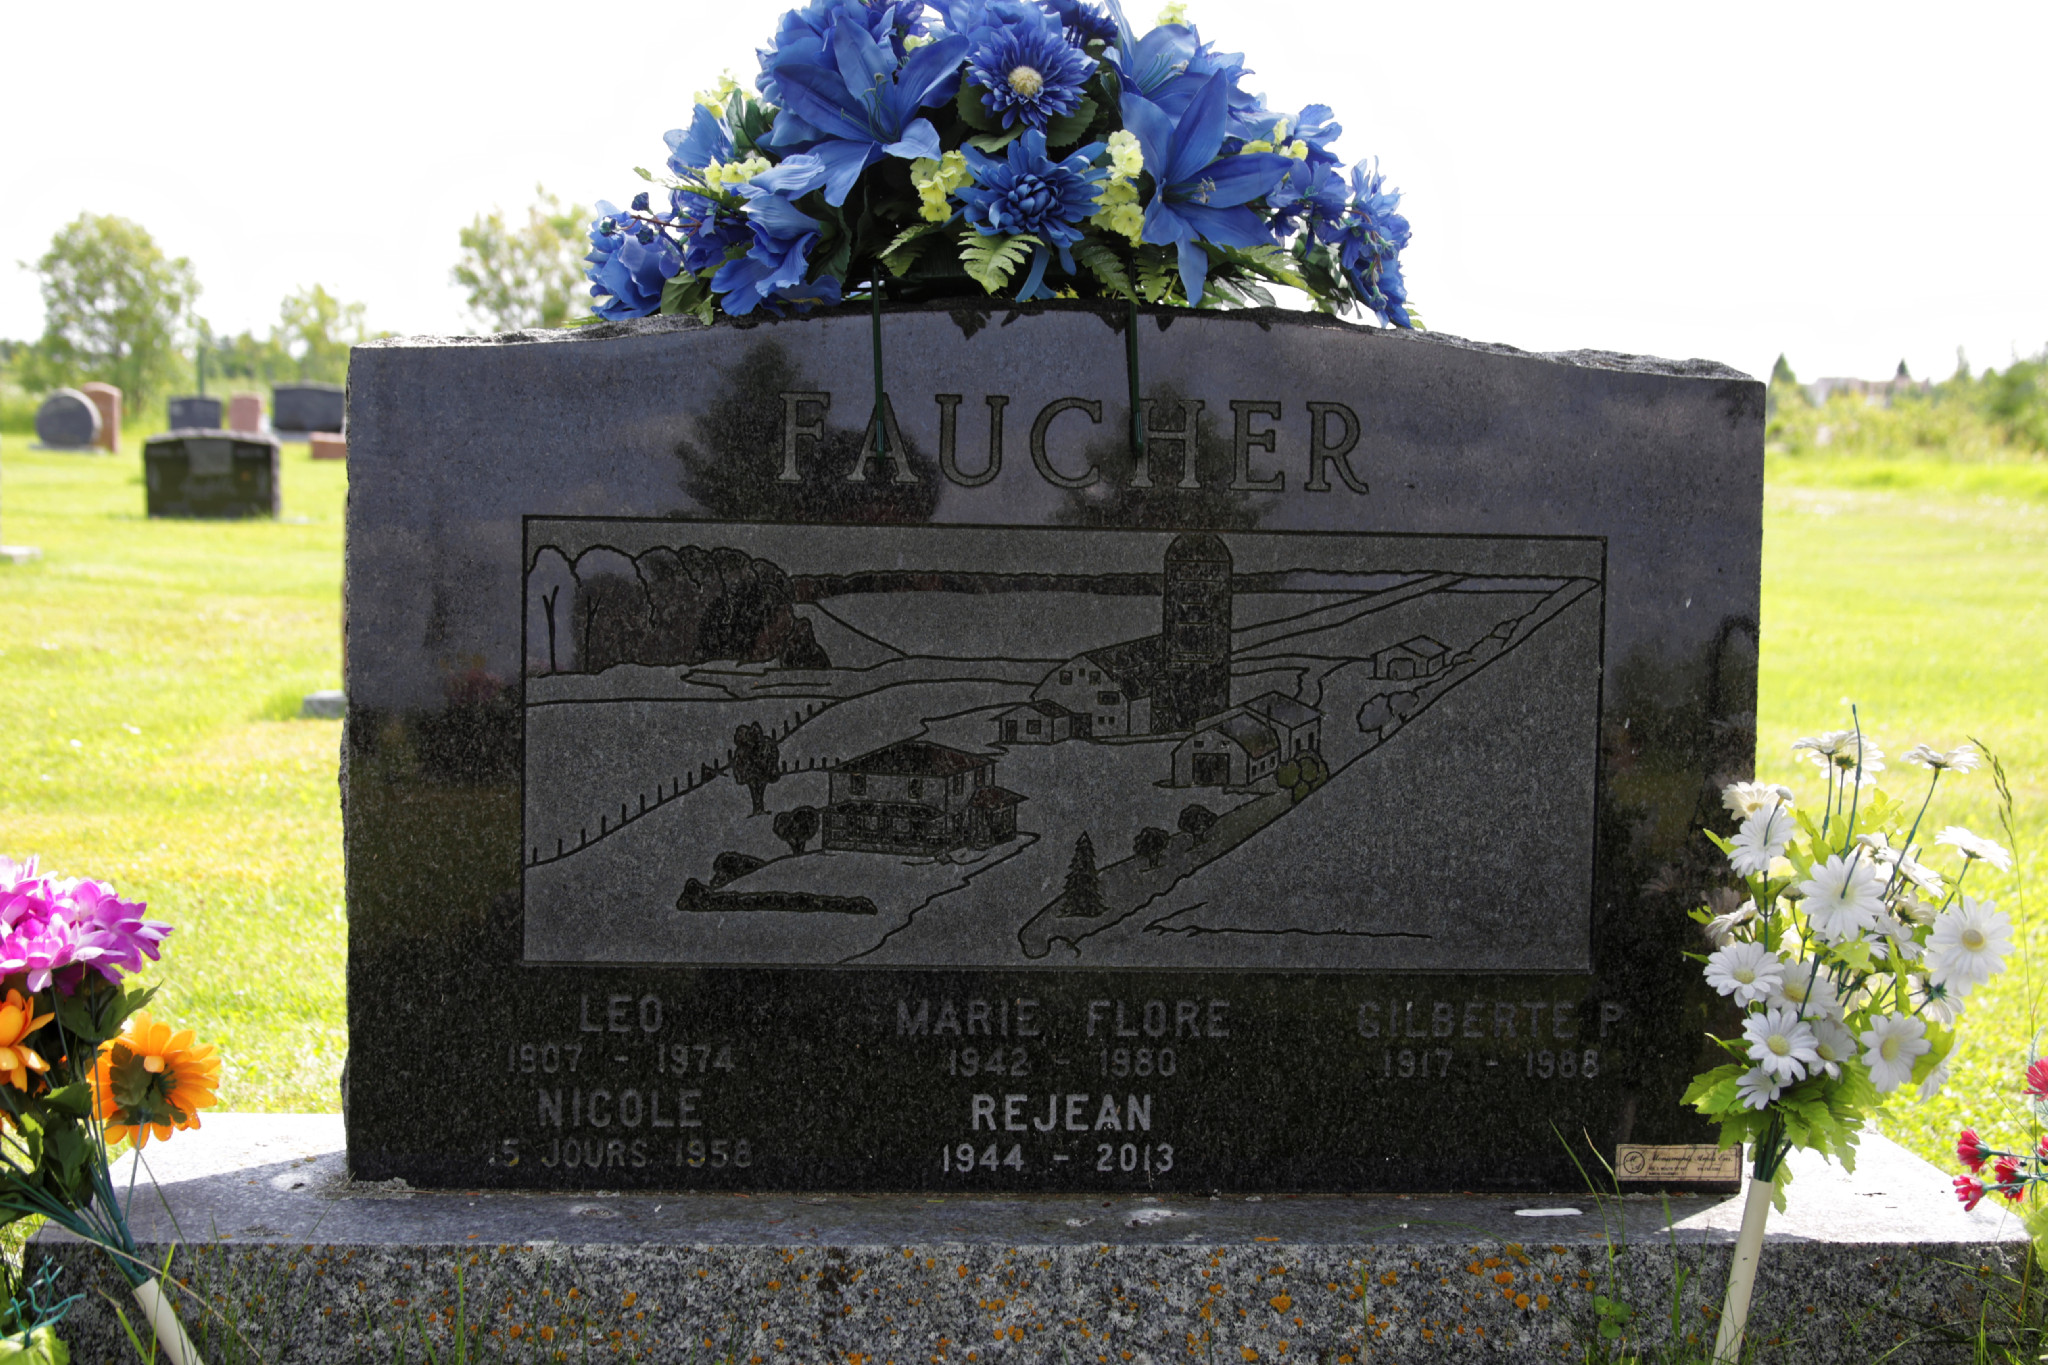 Léo Faucher